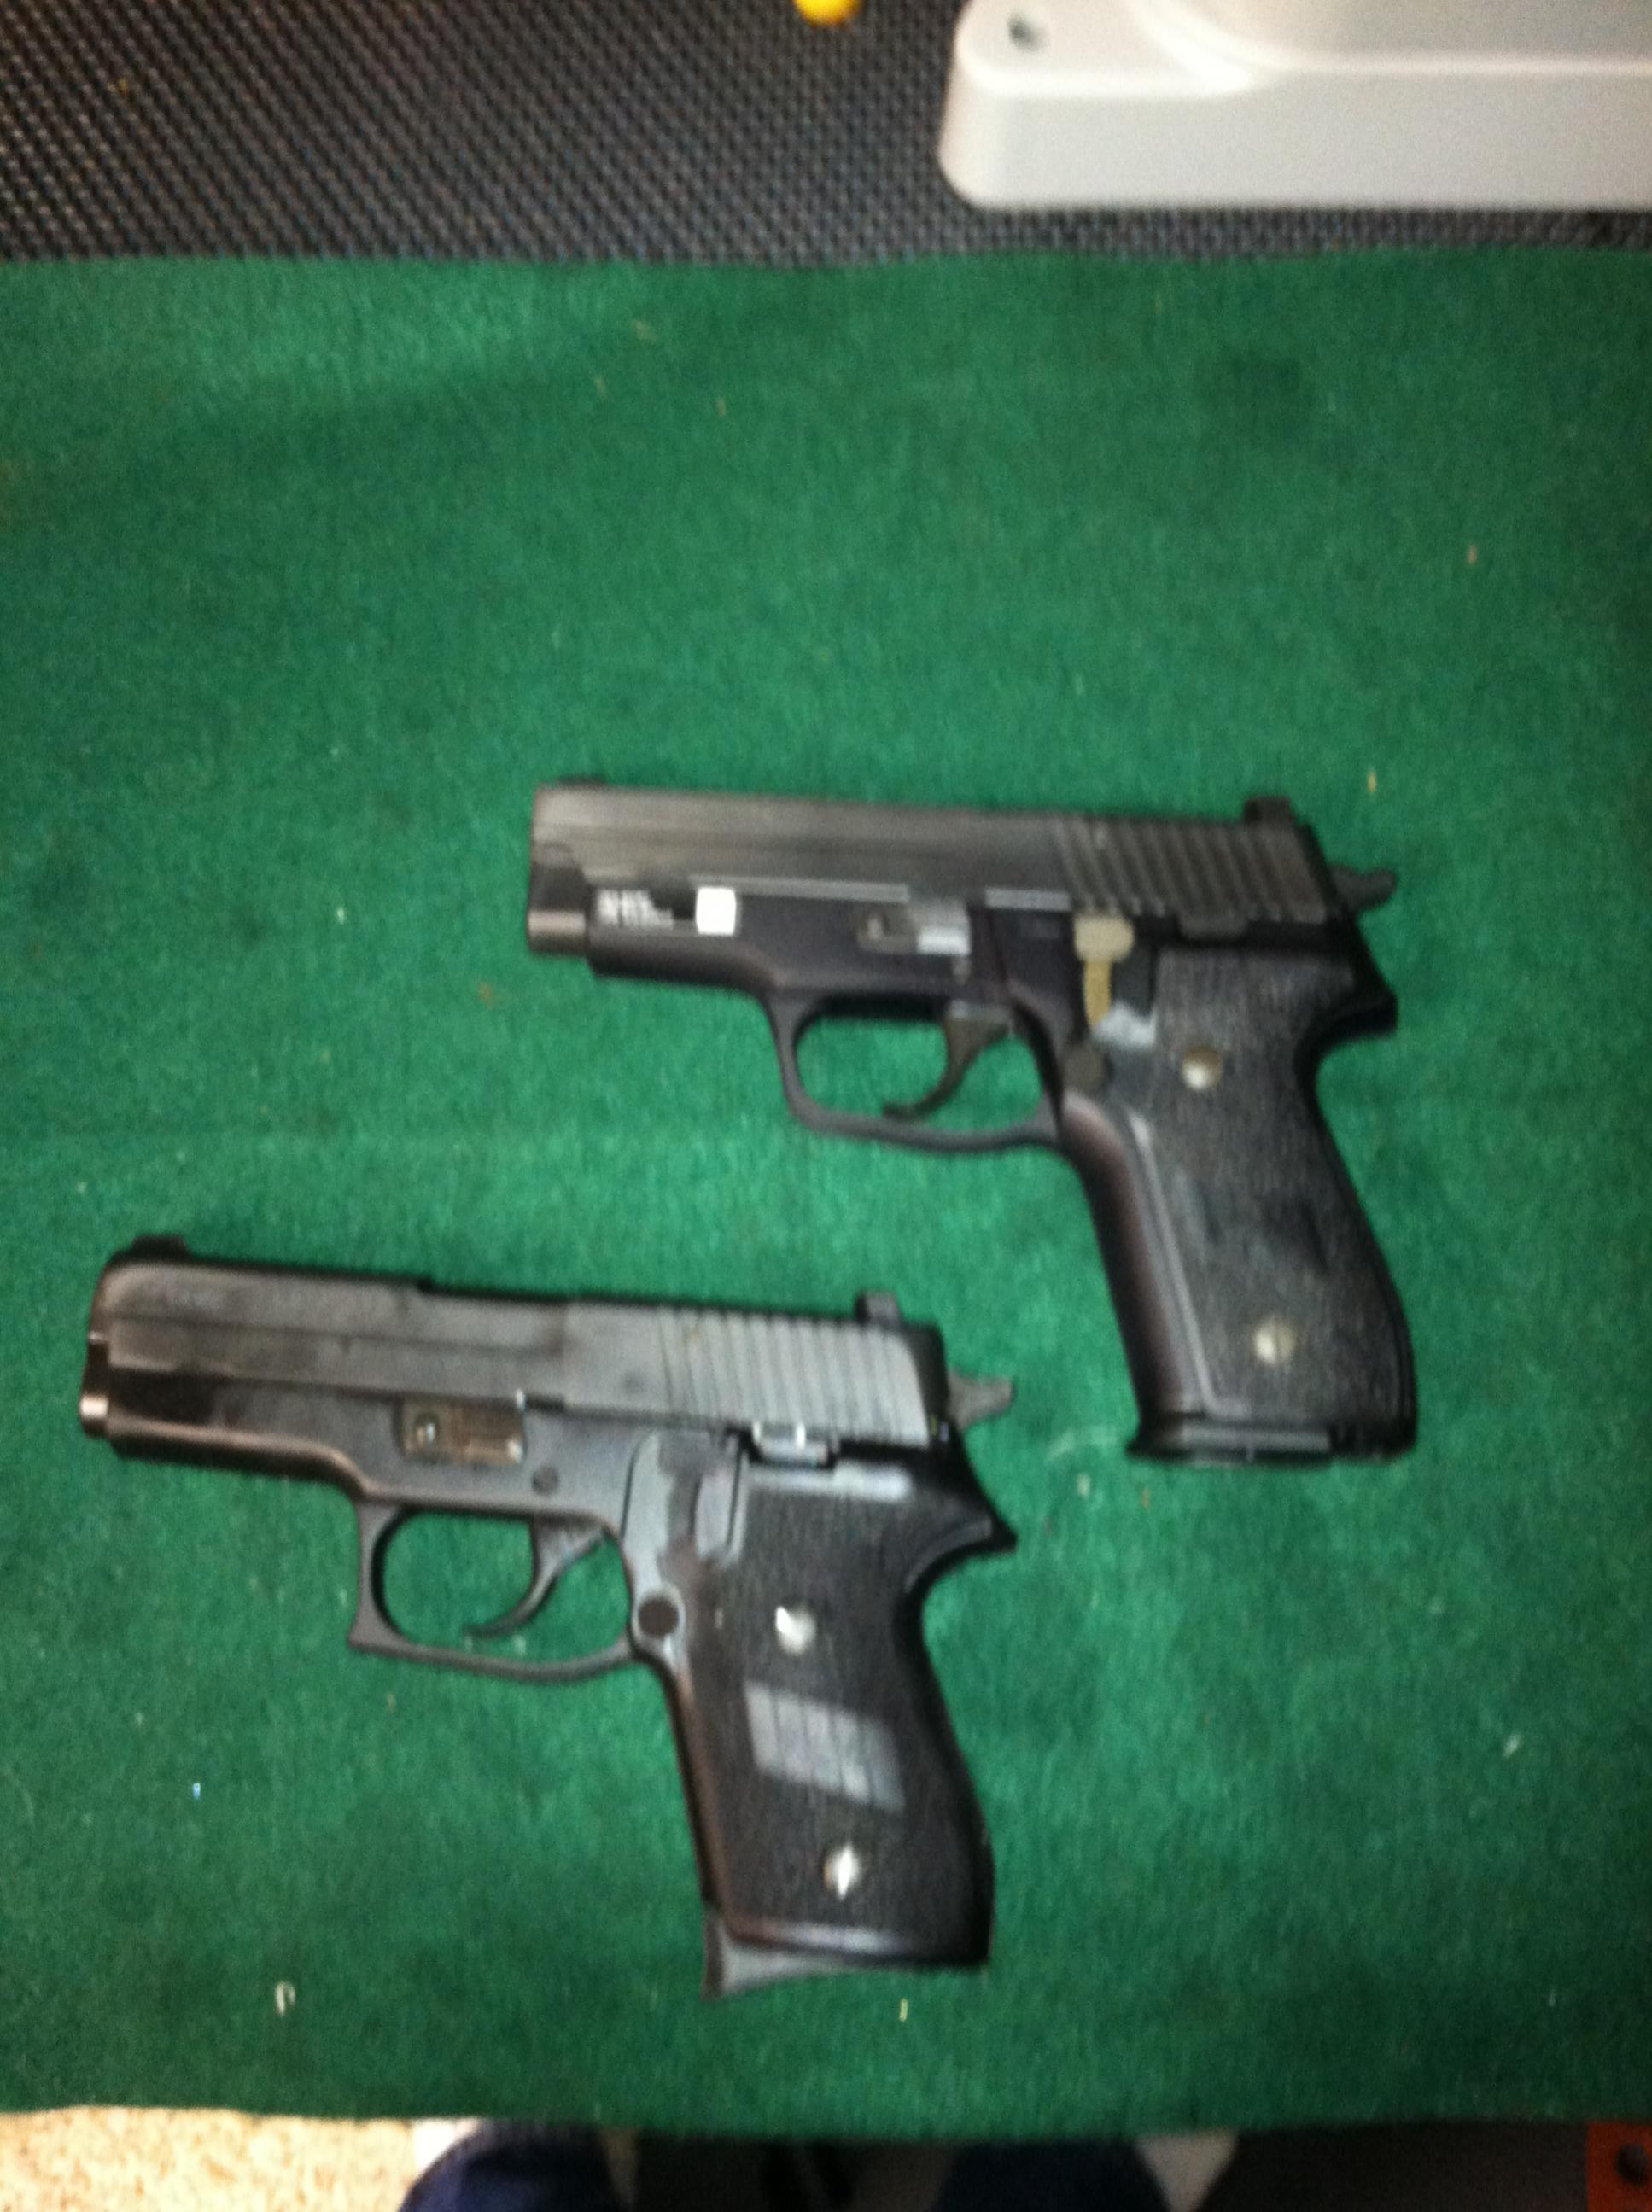 Sig M11-A1 vs Sig P220  SAS comparison  9mm vs 45acp similar size Sigs-sig-pair.jpg